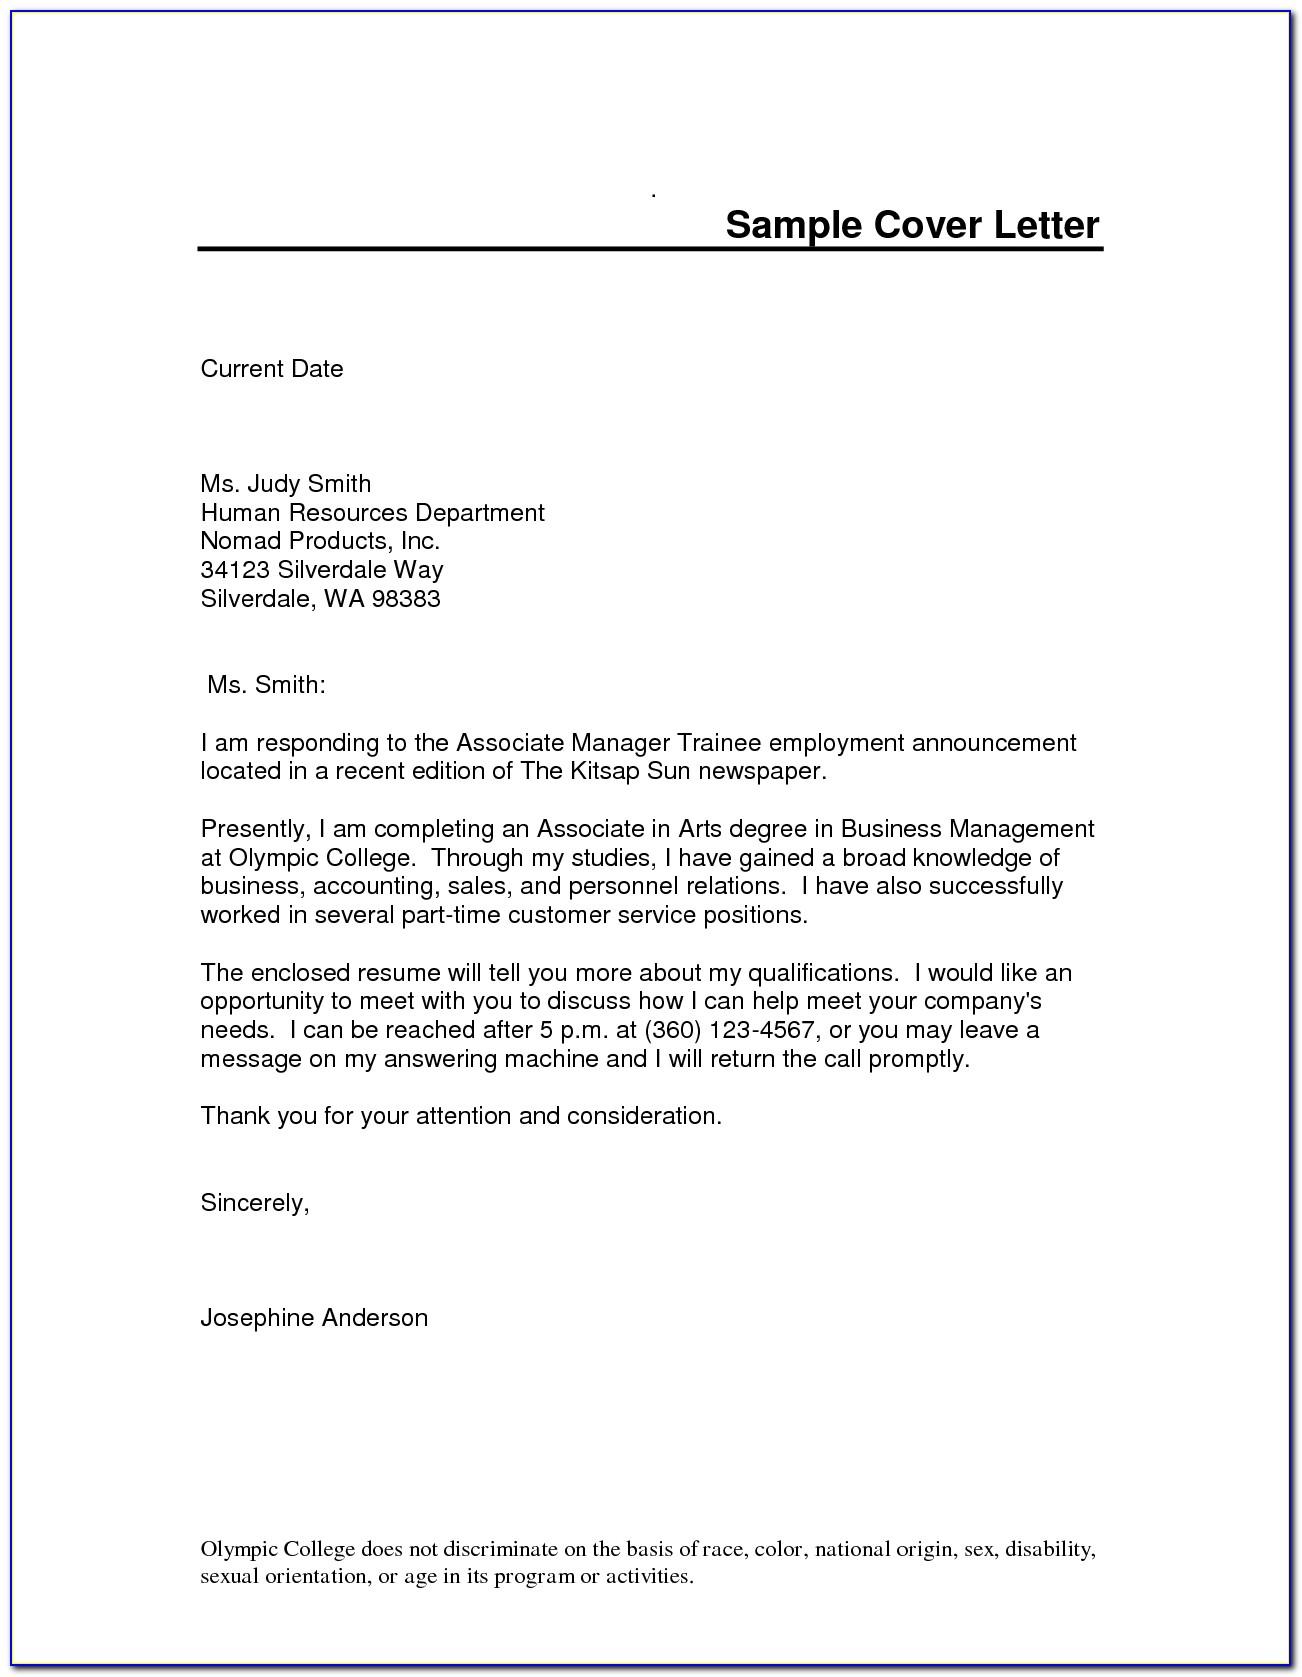 Cover Letter Template For Word Sample Resume Format In Resume Cover Letter Template 2017